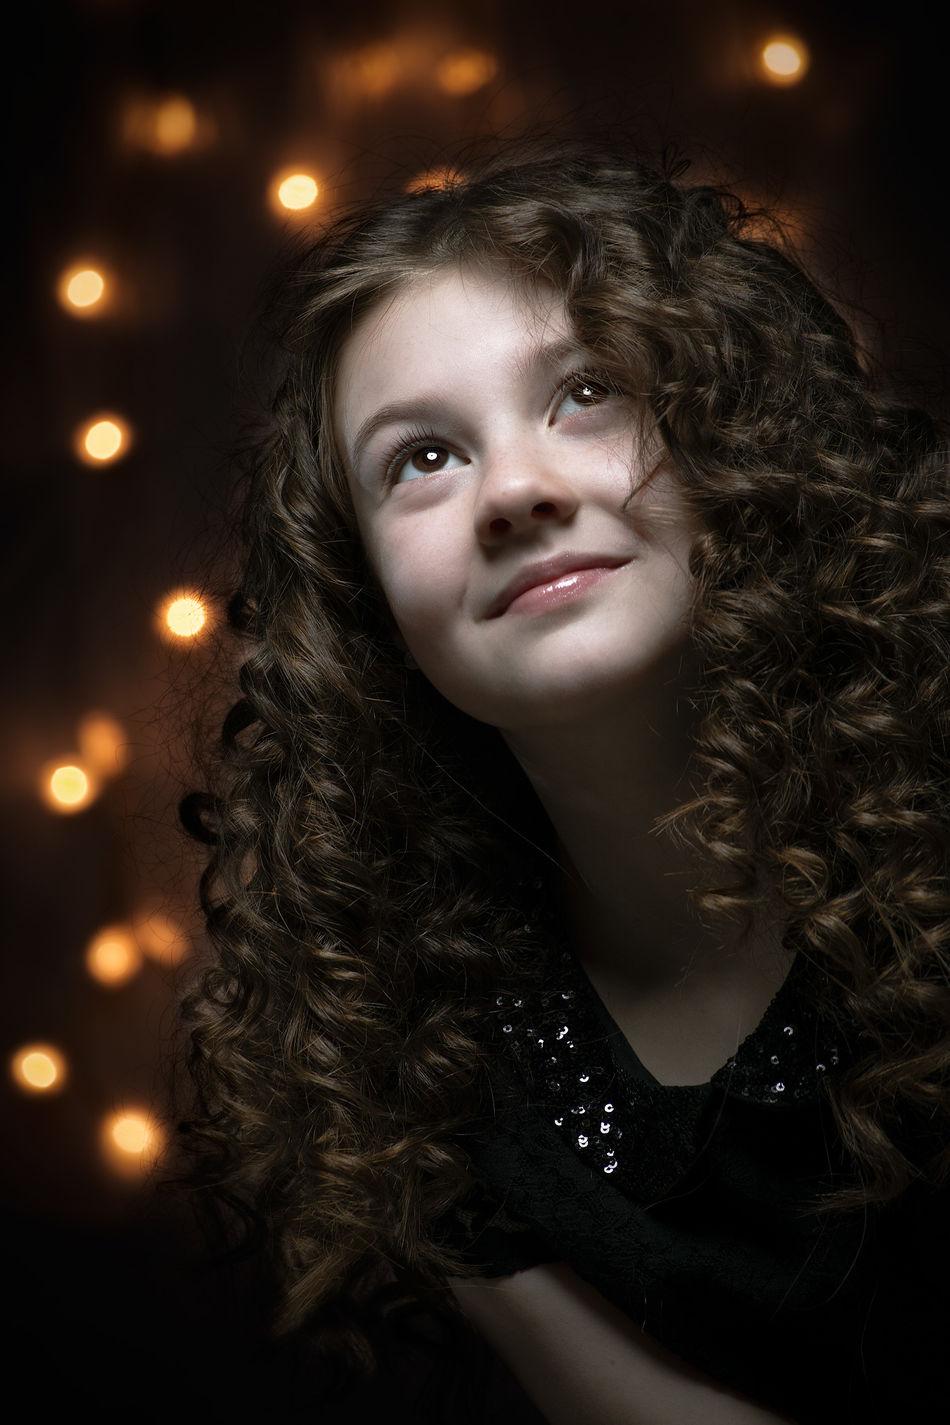 Beautiful stock photos of weihnachten, 8-9 Years, Caucasian Ethnicity, Celebration, Christmas